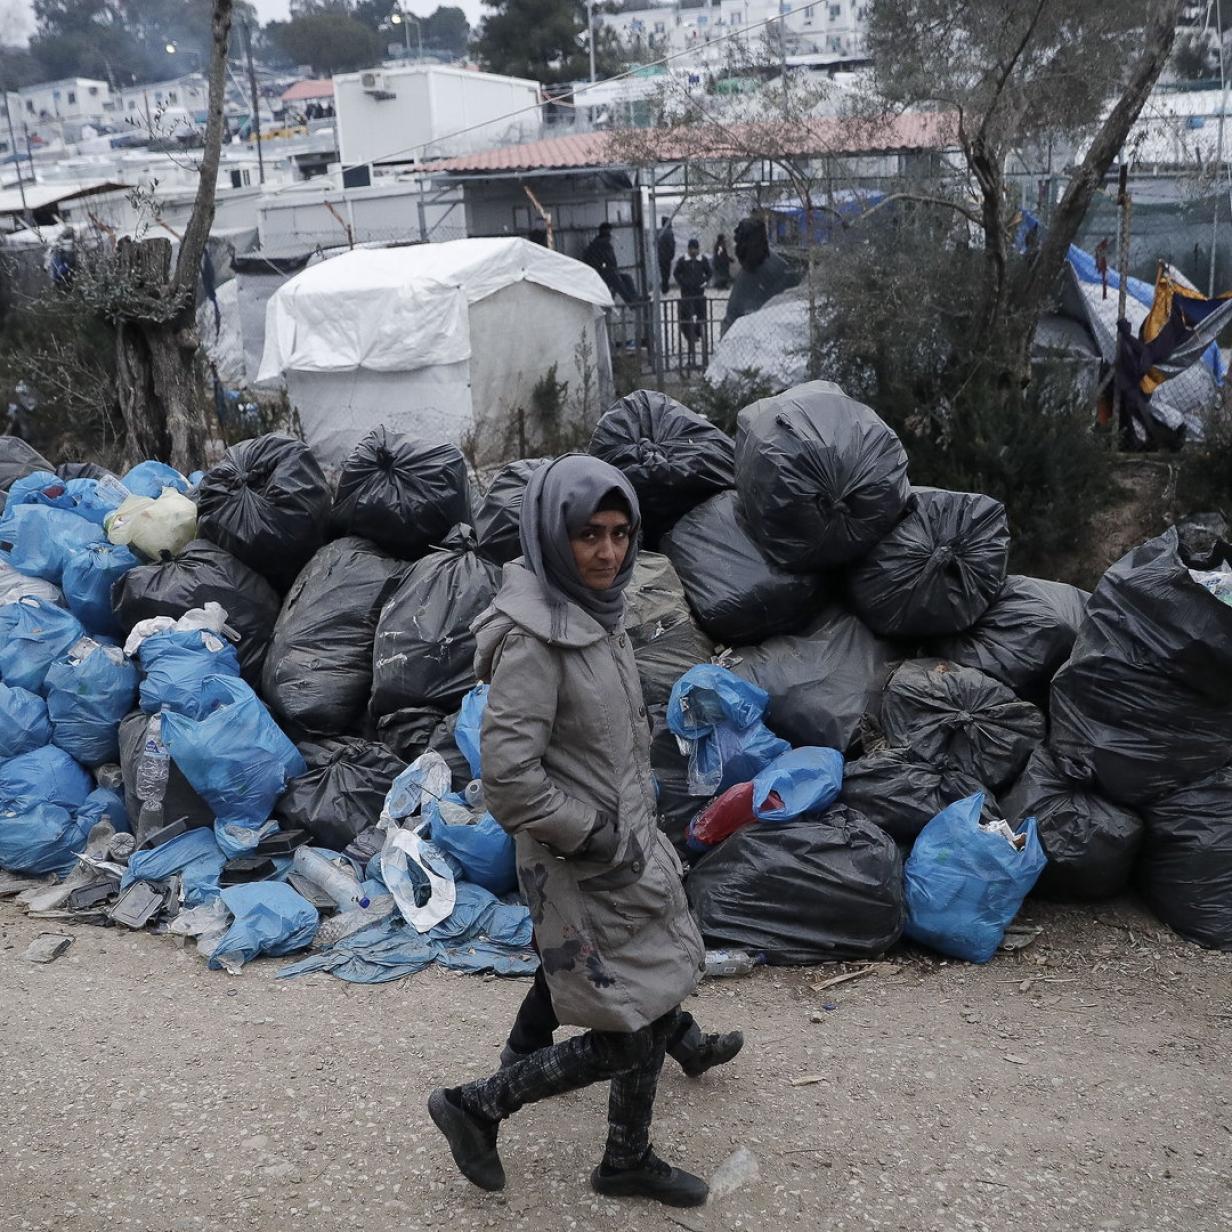 """Schande Europas"": Ziegler vergleicht EU-Flüchtlingslager mit KZ"